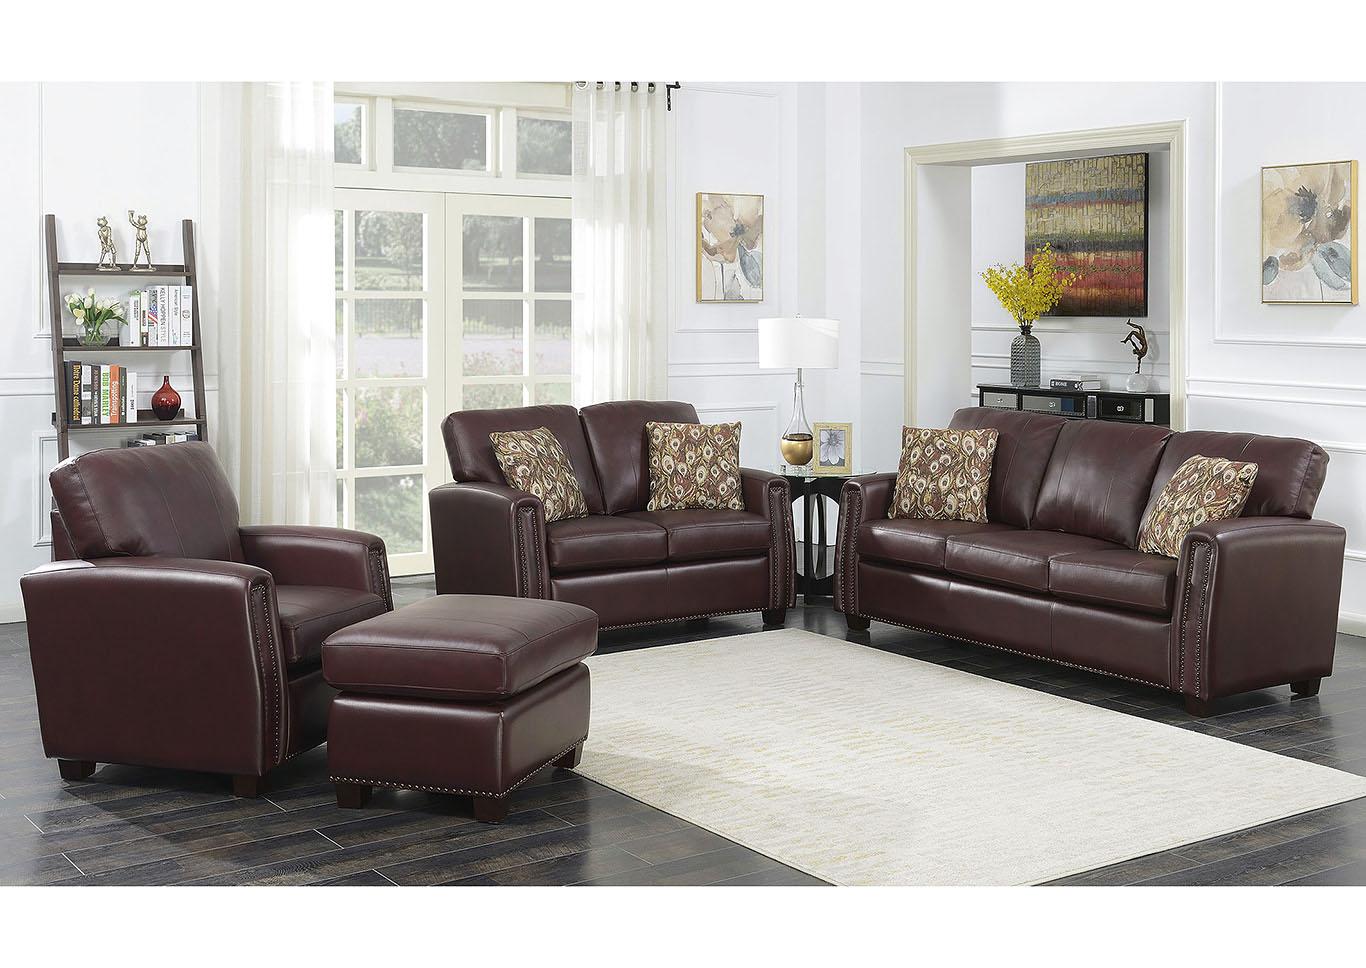 Stephanie Burdy Leather Match, Leather Living Room